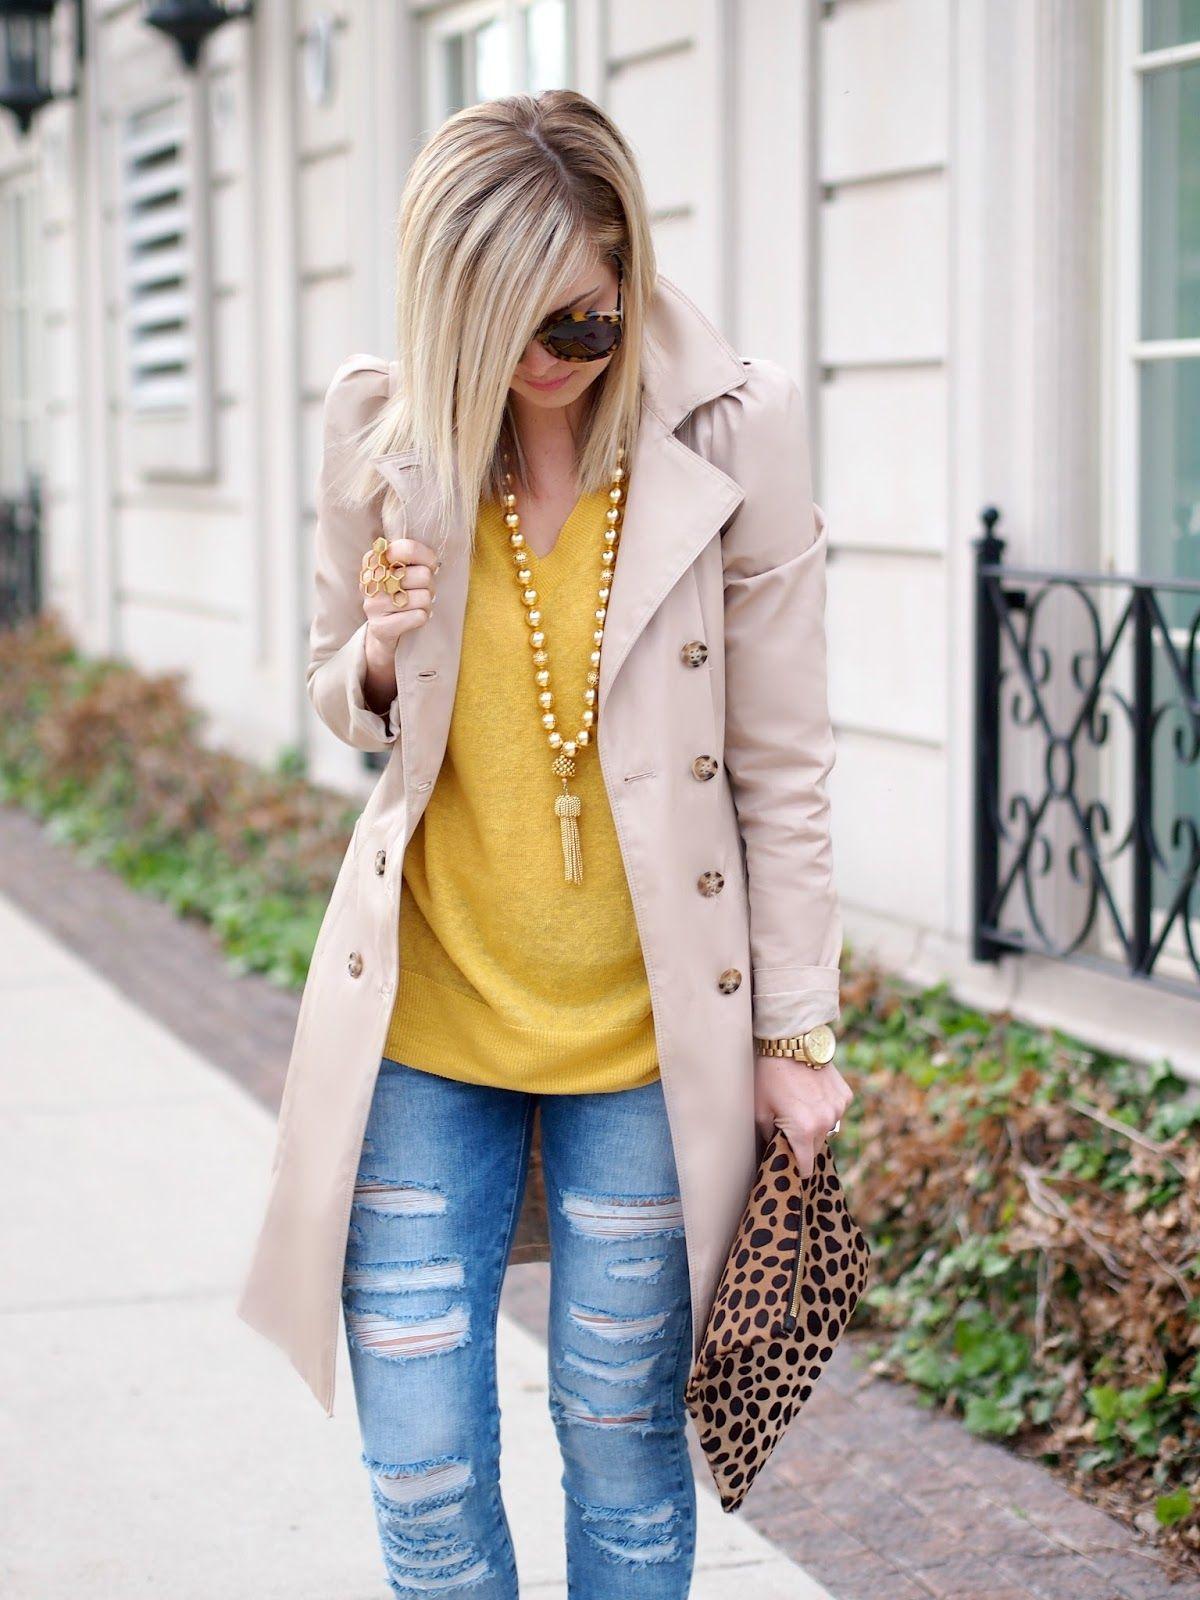 Mellow Yellow Jacket: Zara {old,similar} | Sweater: c/oJoe Fresh| Necklace: c/oLisi Lerch| Jeans: Zara {similar} | Shoes: Nine West Canada {old,similar}| Clutch:Clare Vivier| Sunglasses:Karen Walker| Ring: c/oShahla Karimi| Watch:Michael Kors